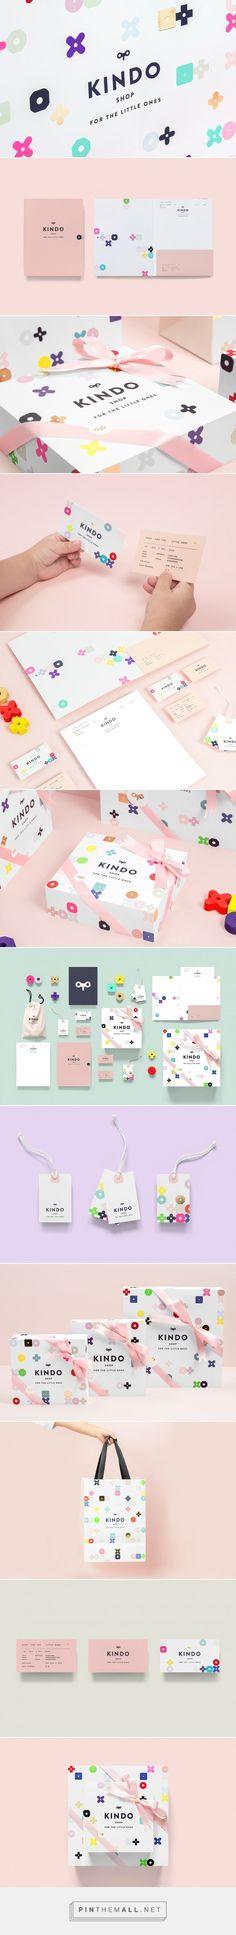 Kindo / Anagrama | AA13 – blog – Inspiration – Design – Architecture – Photographie – Art - created via https://pinthemall.net